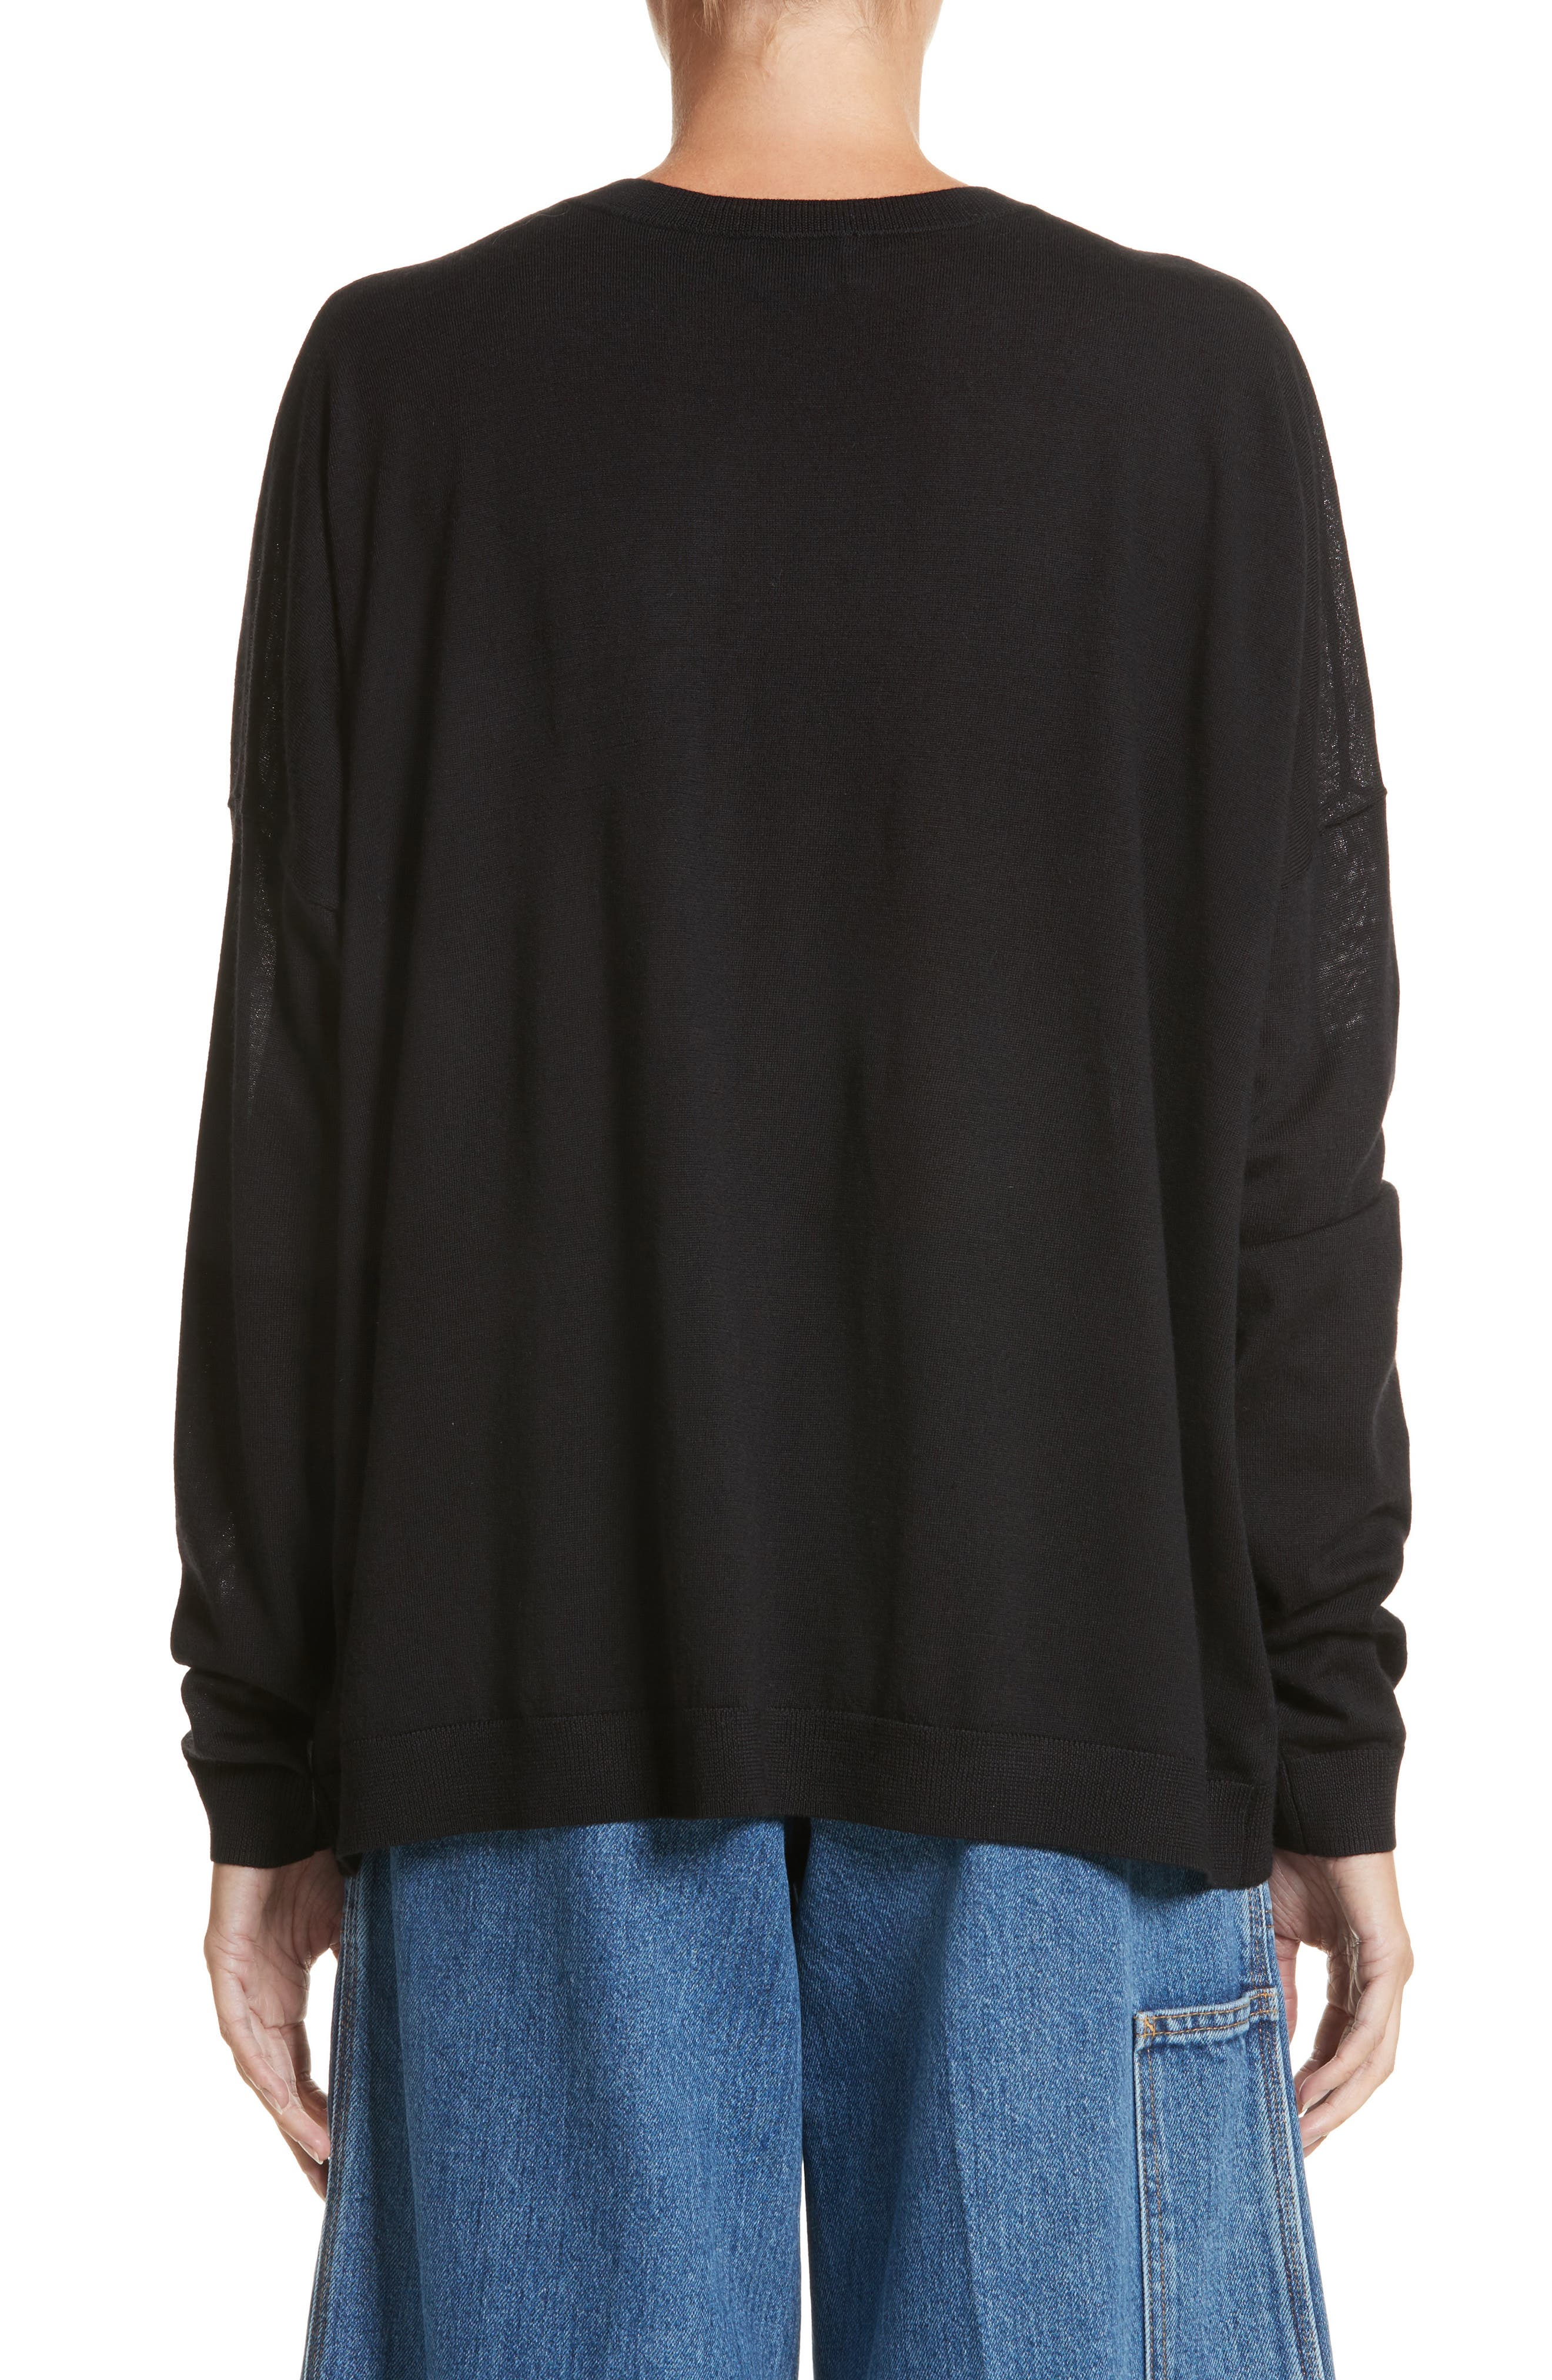 Karel Oversize Merino Sweater,                             Alternate thumbnail 2, color,                             001